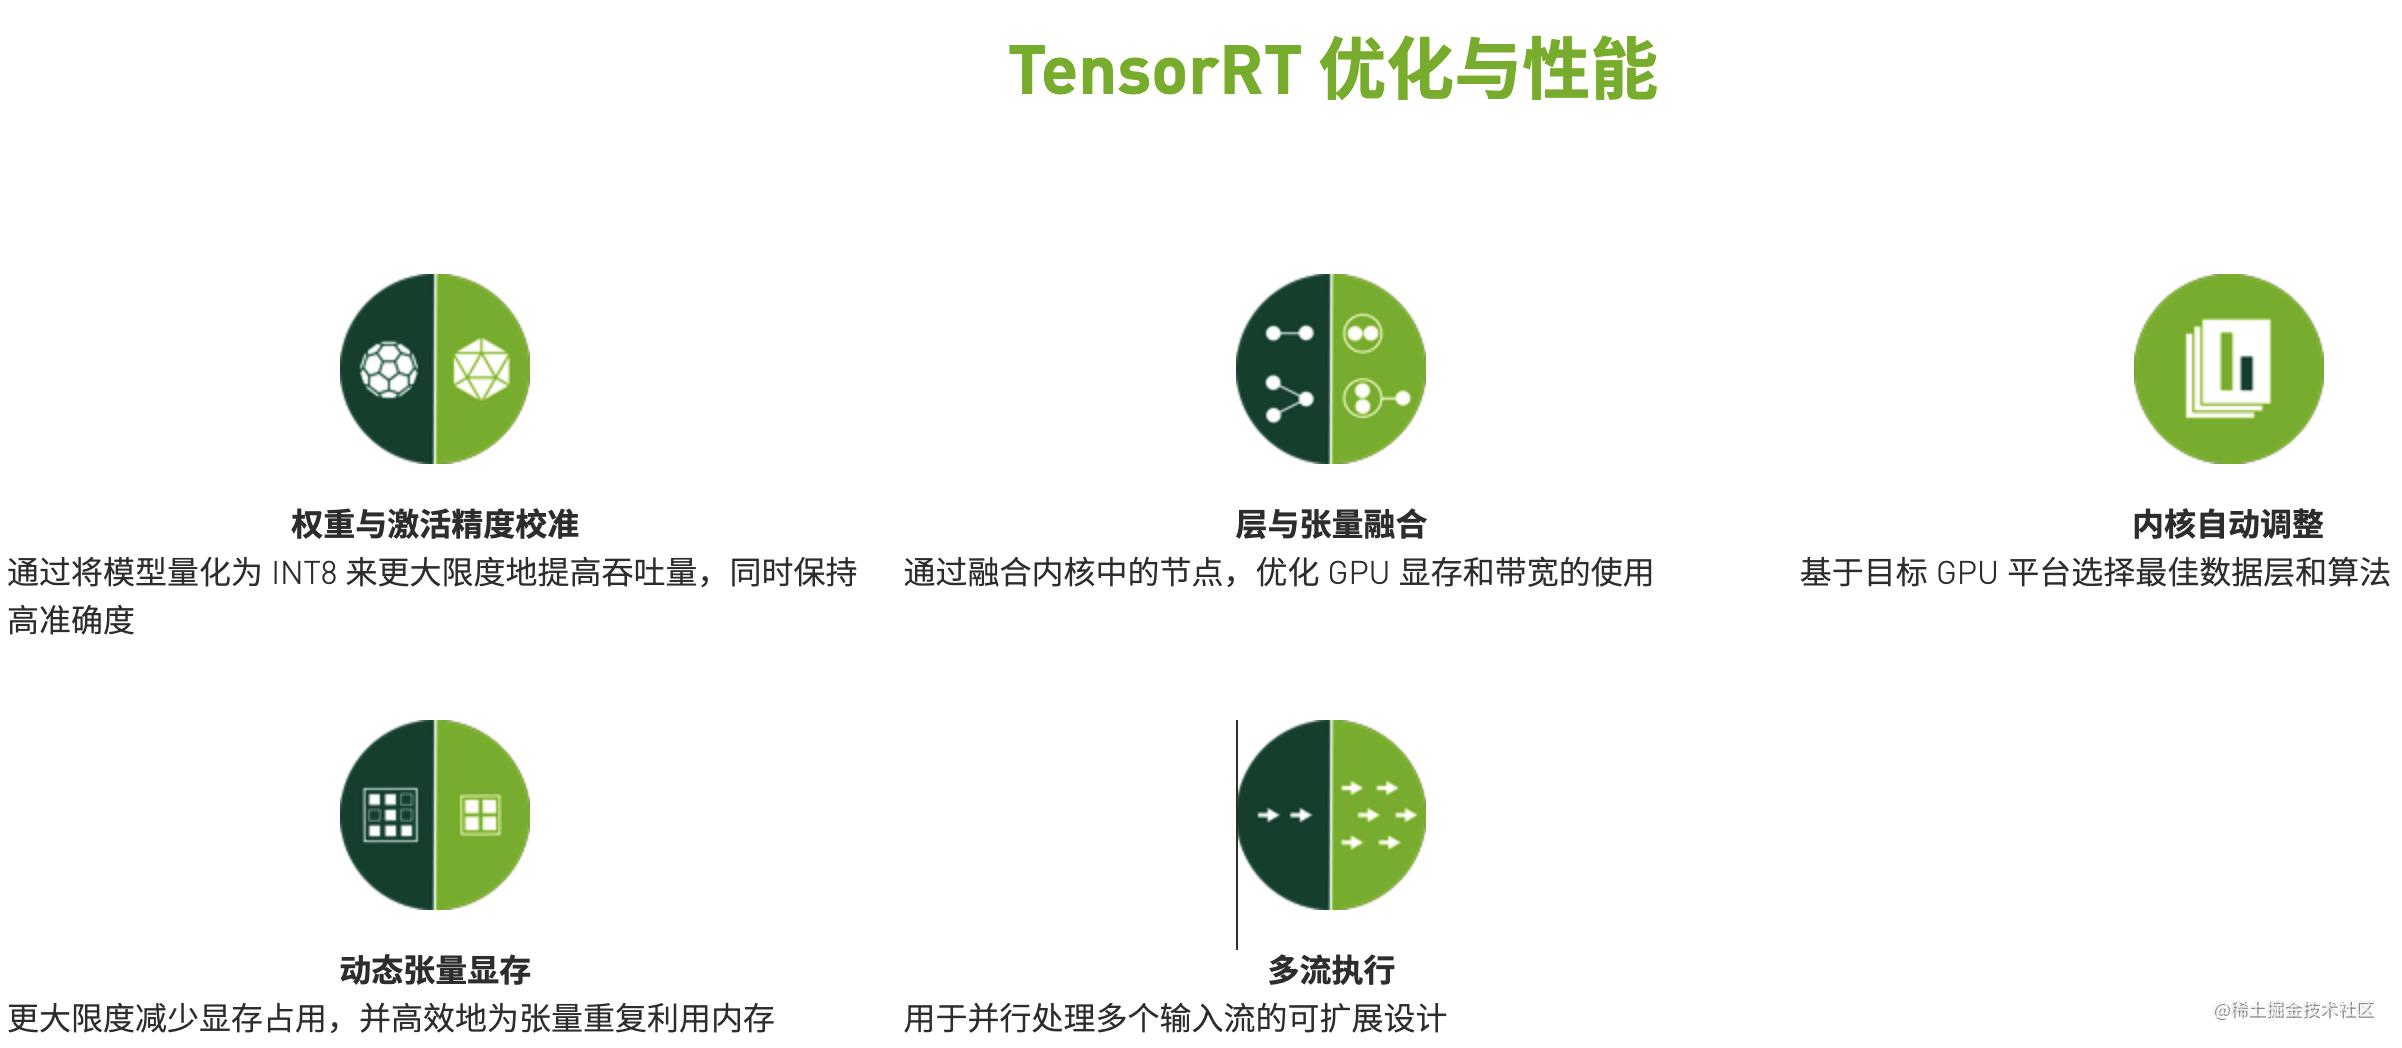 TensorRT的核心部分并没有开源